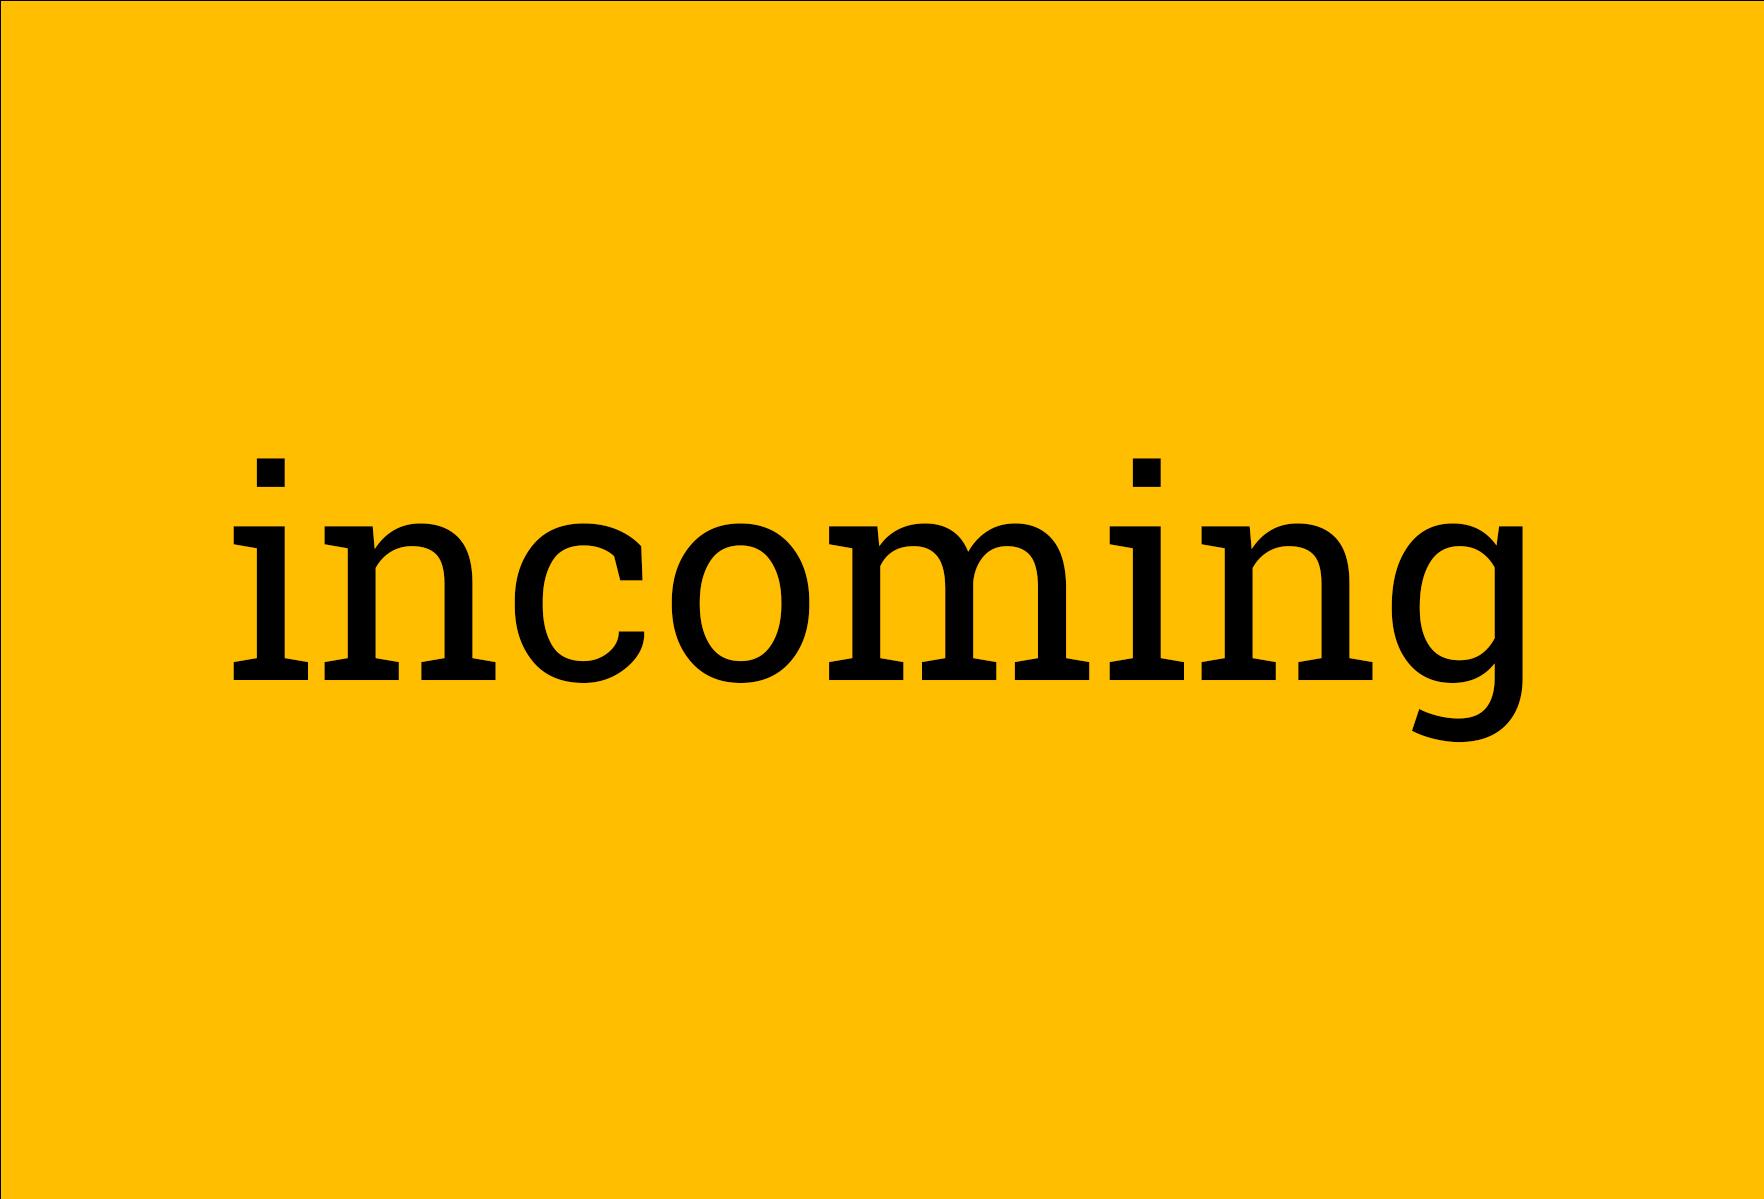 Incoming